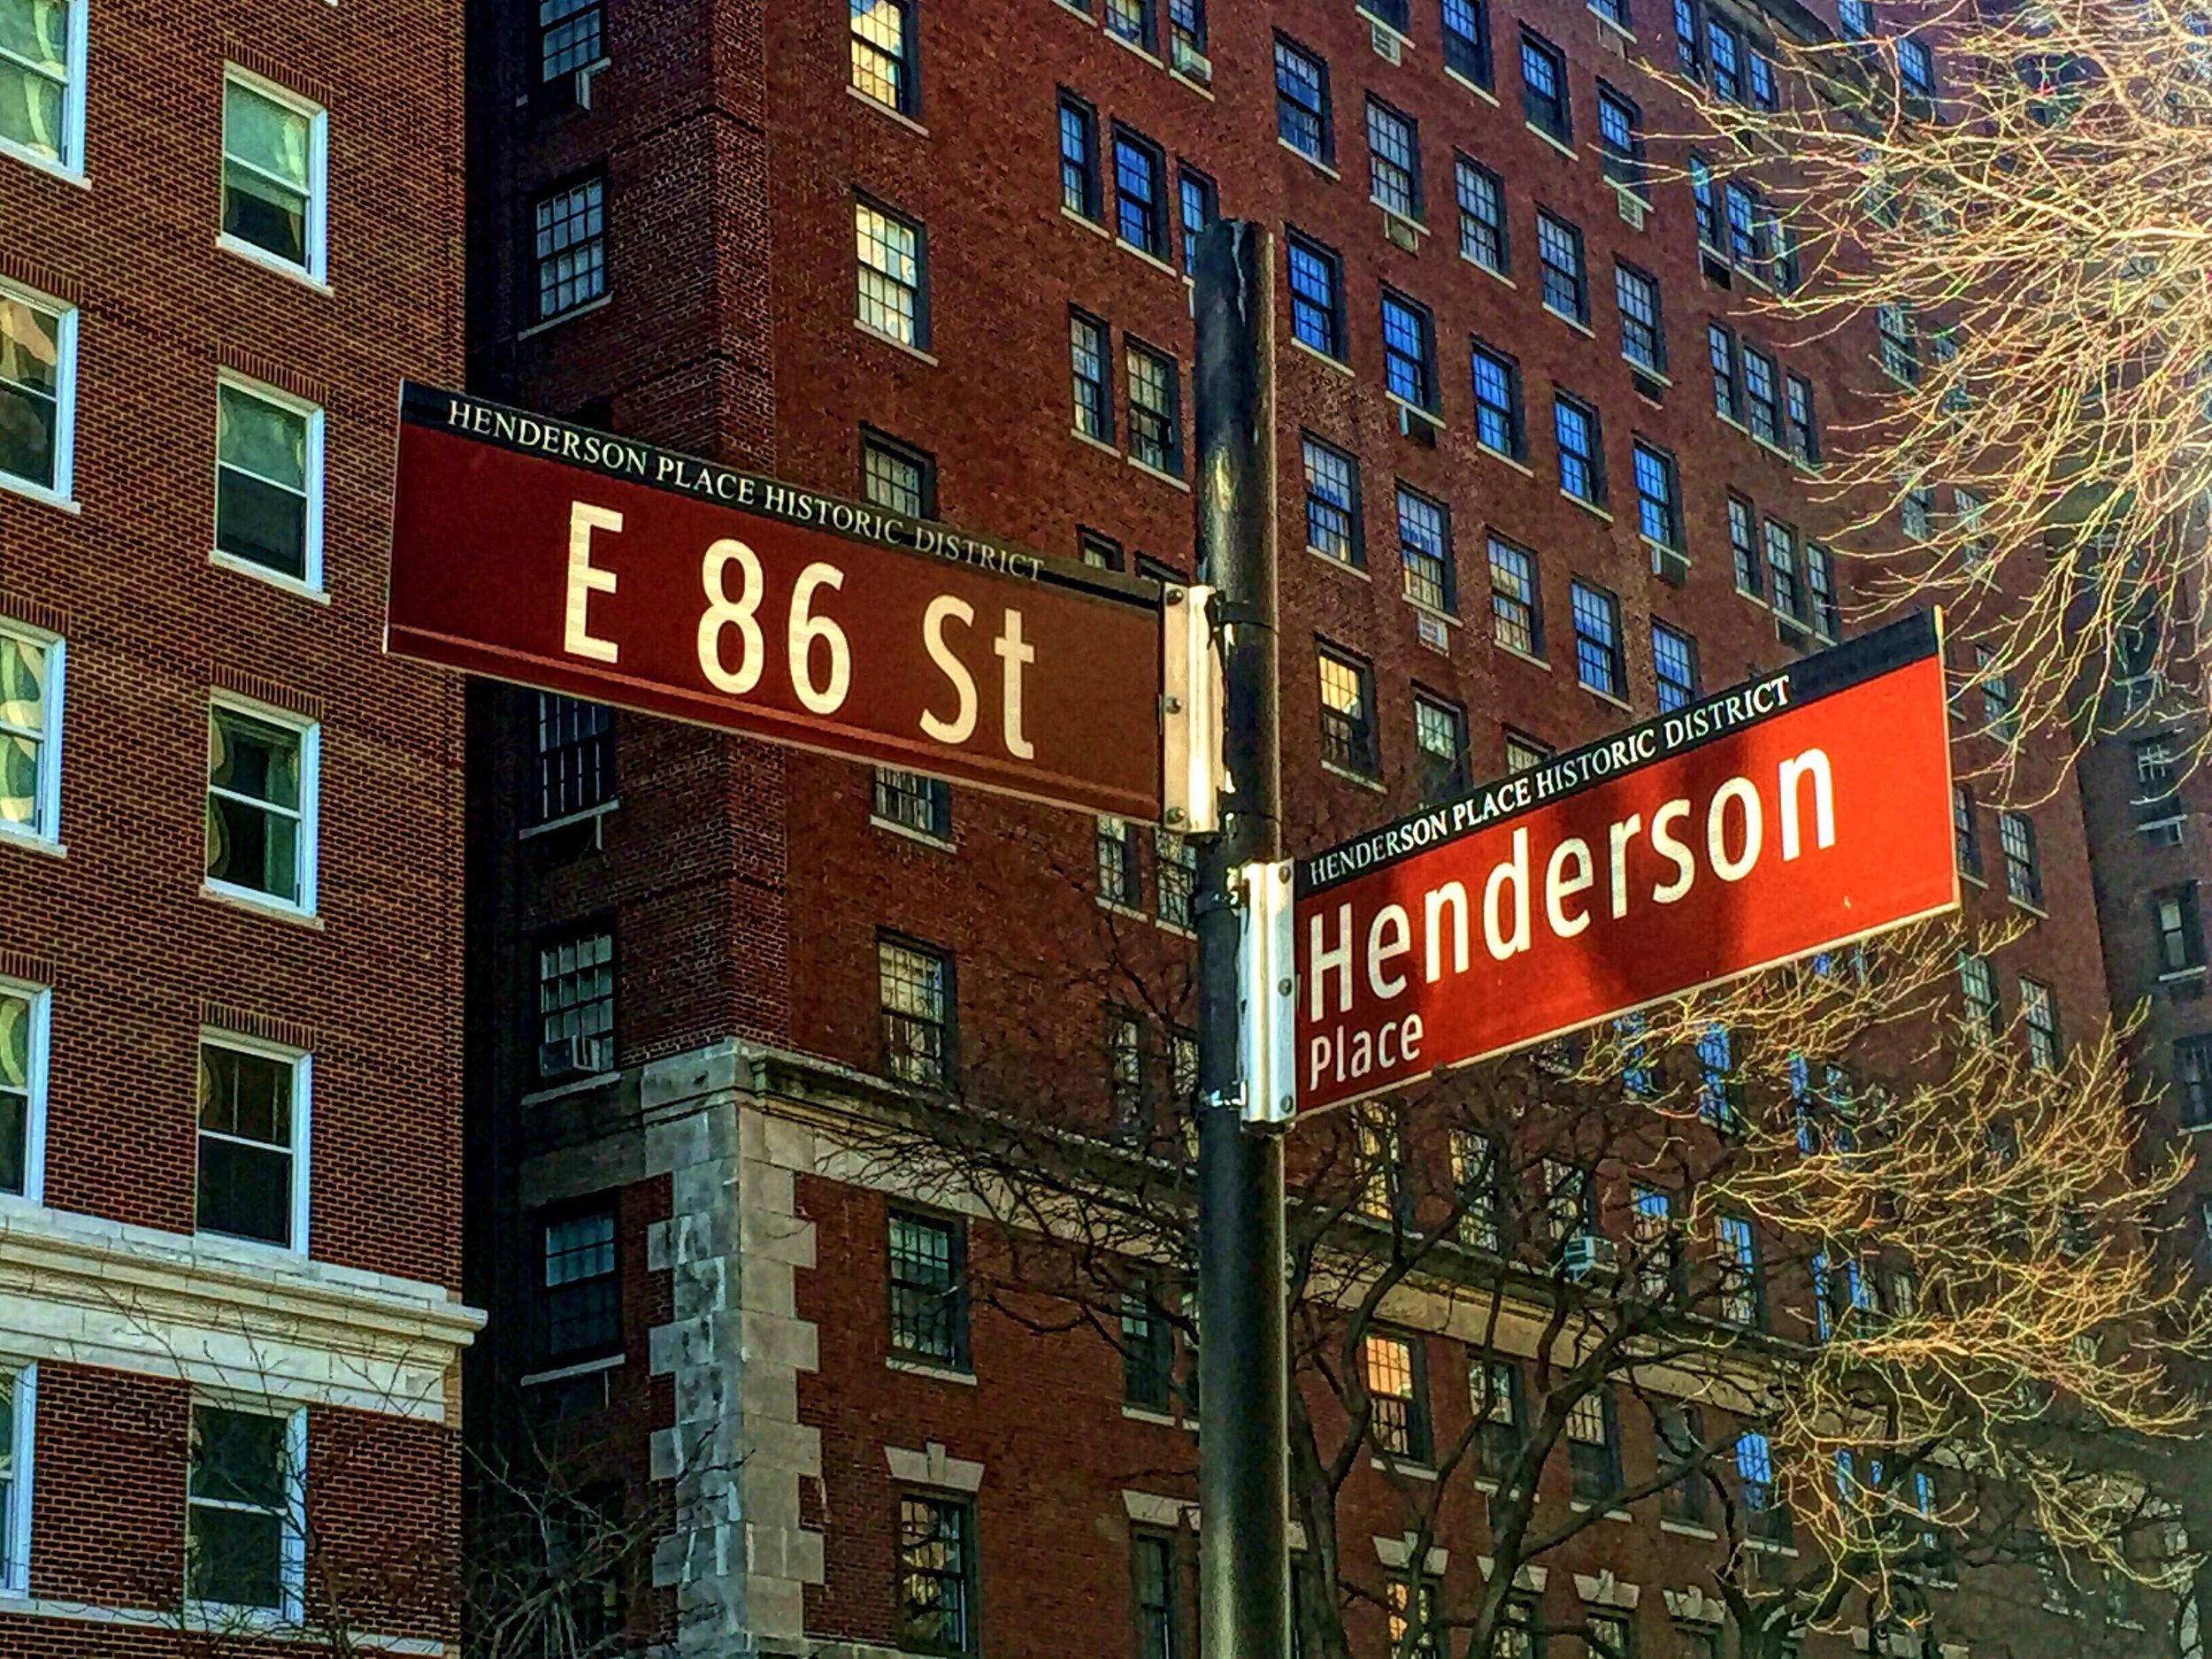 02-15-16 Henderson Place 4.jpg